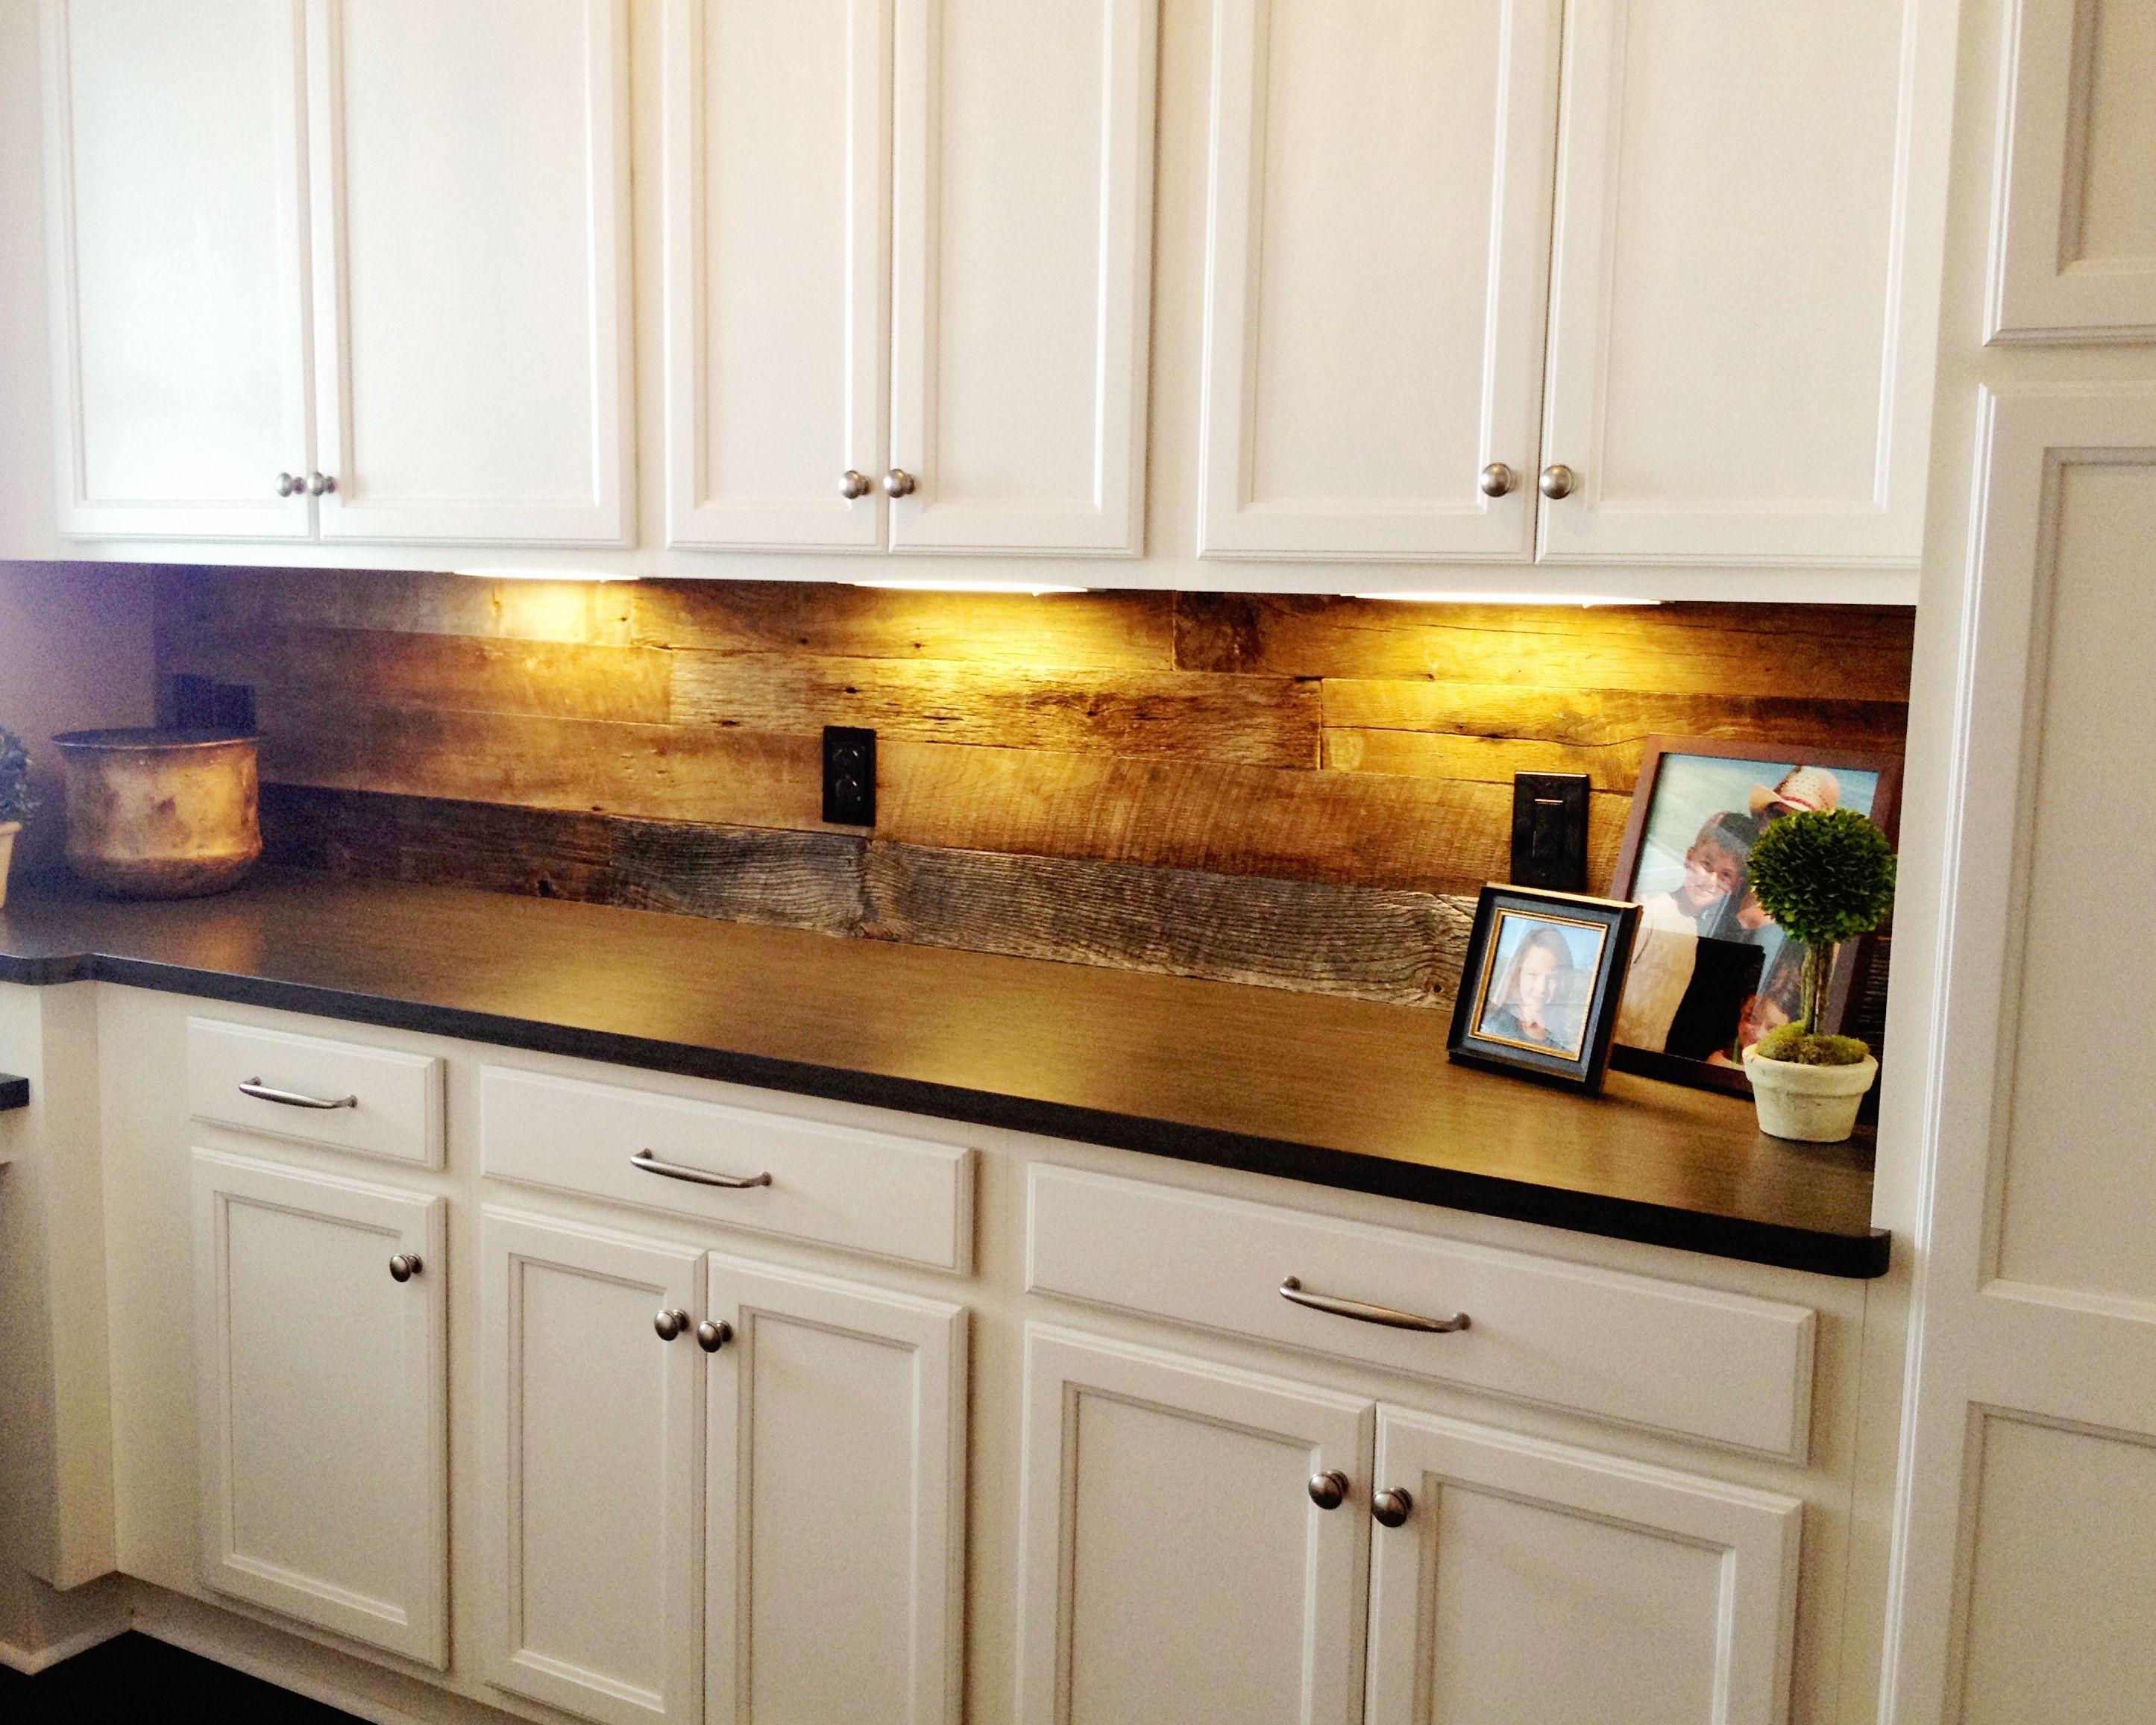 Astounding Cool Tips Geometric Backsplash Marble Countertops Penny Backsplash Color Schemes Stainless S Wood Kitchen Backsplash Kitchen Design Kitchen Remodel